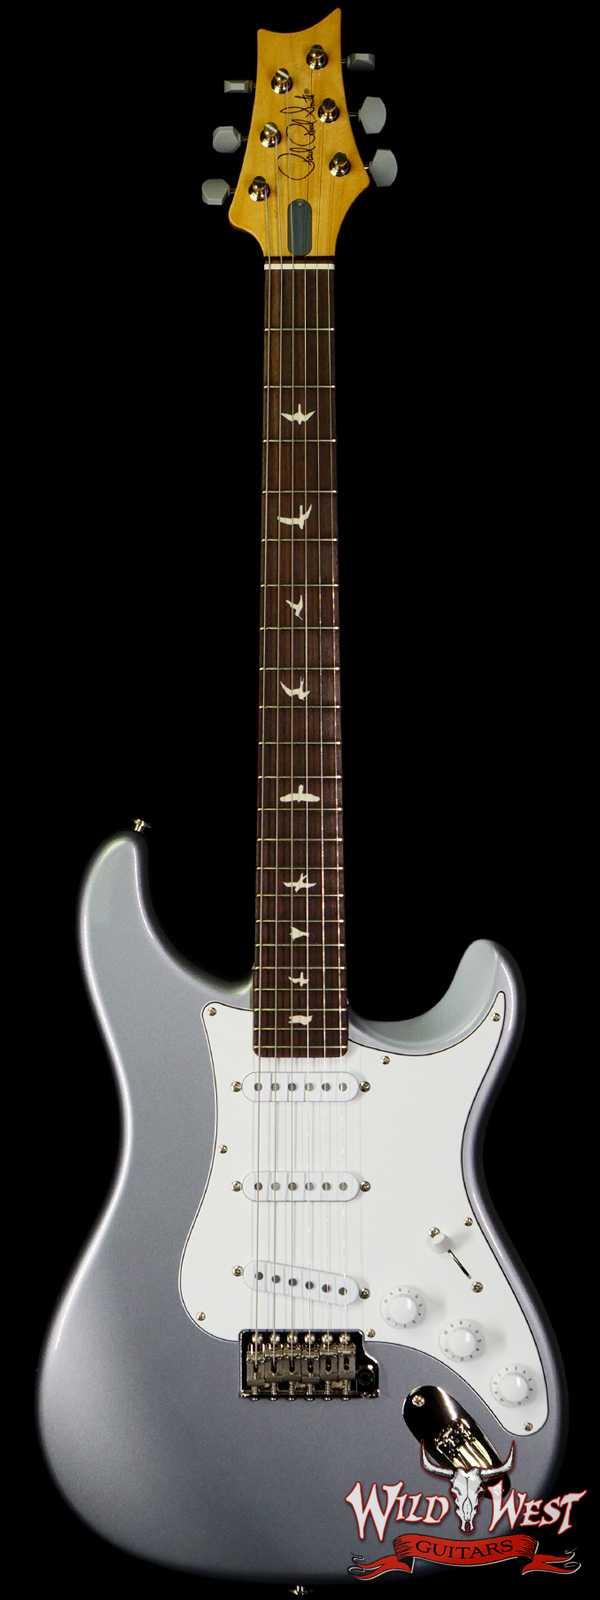 PRS John Mayer Signature Model Silver Sky Maple Neck Rosewood Fingerboard Tungsten (Silver)